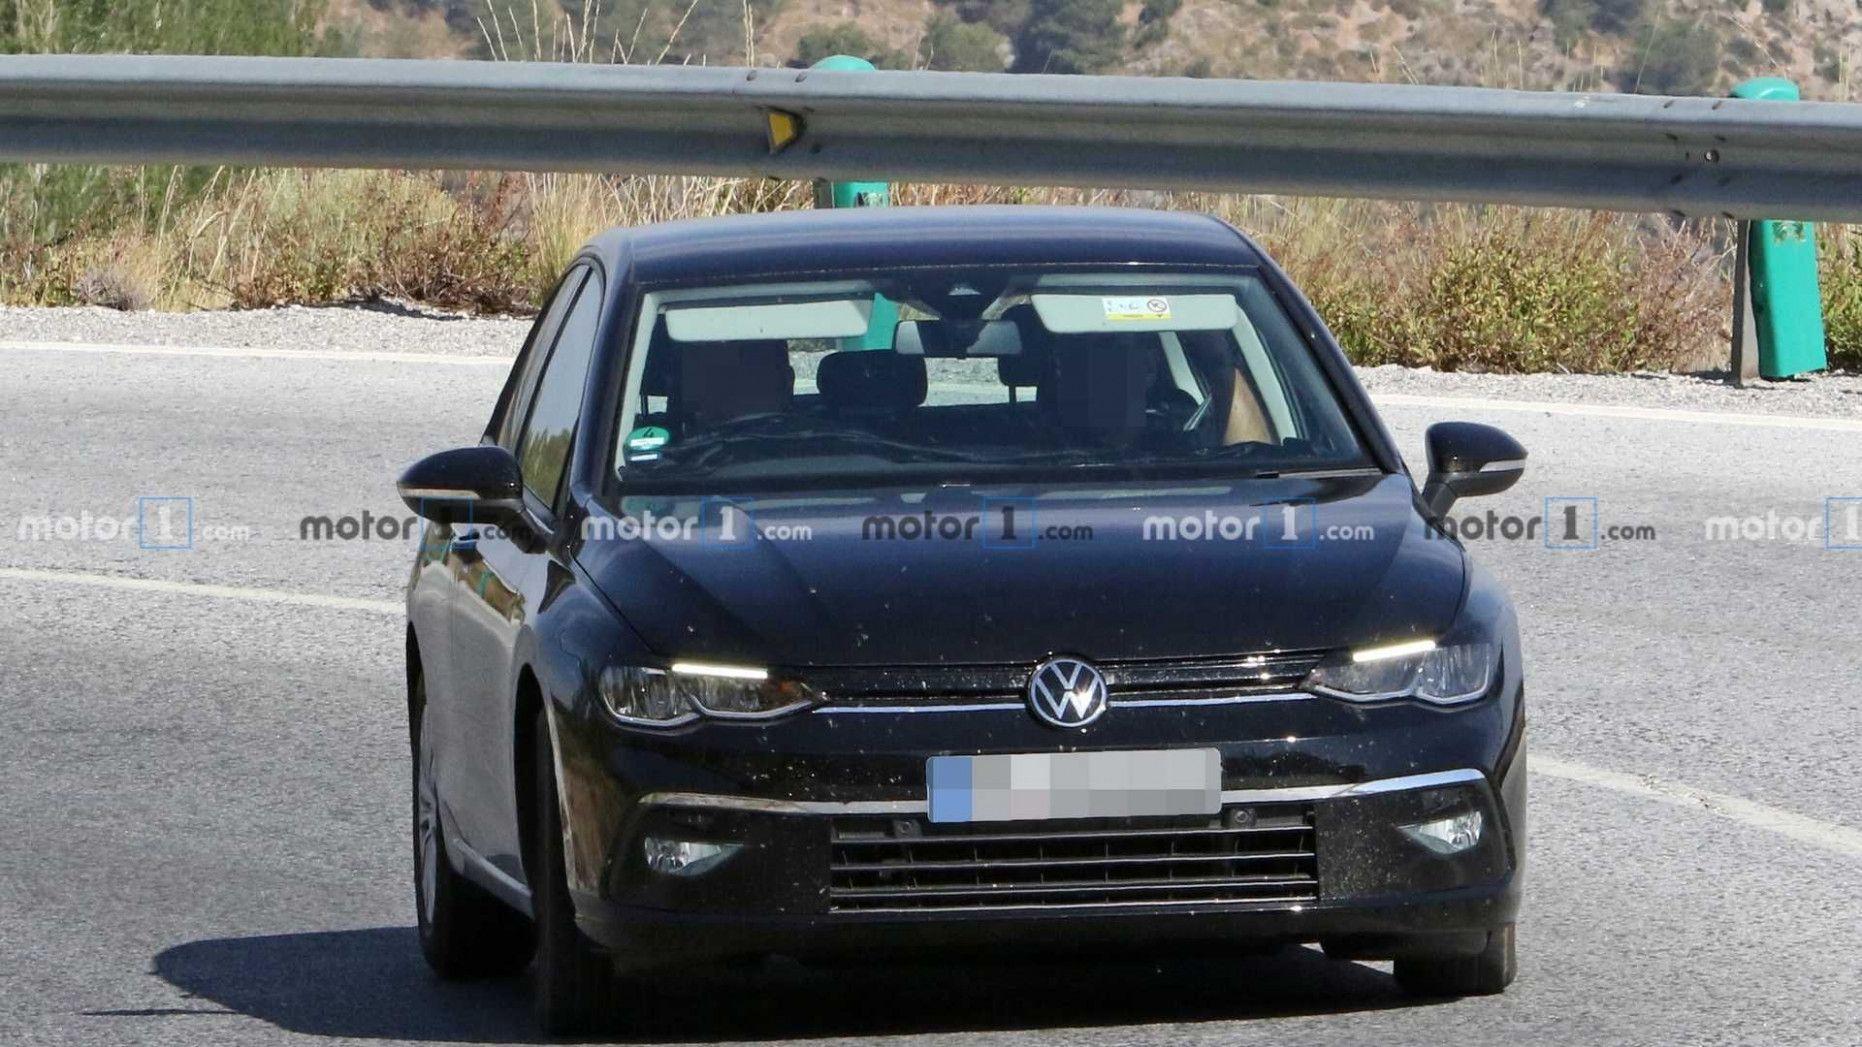 2020 Volkswagen Uk Price And Review